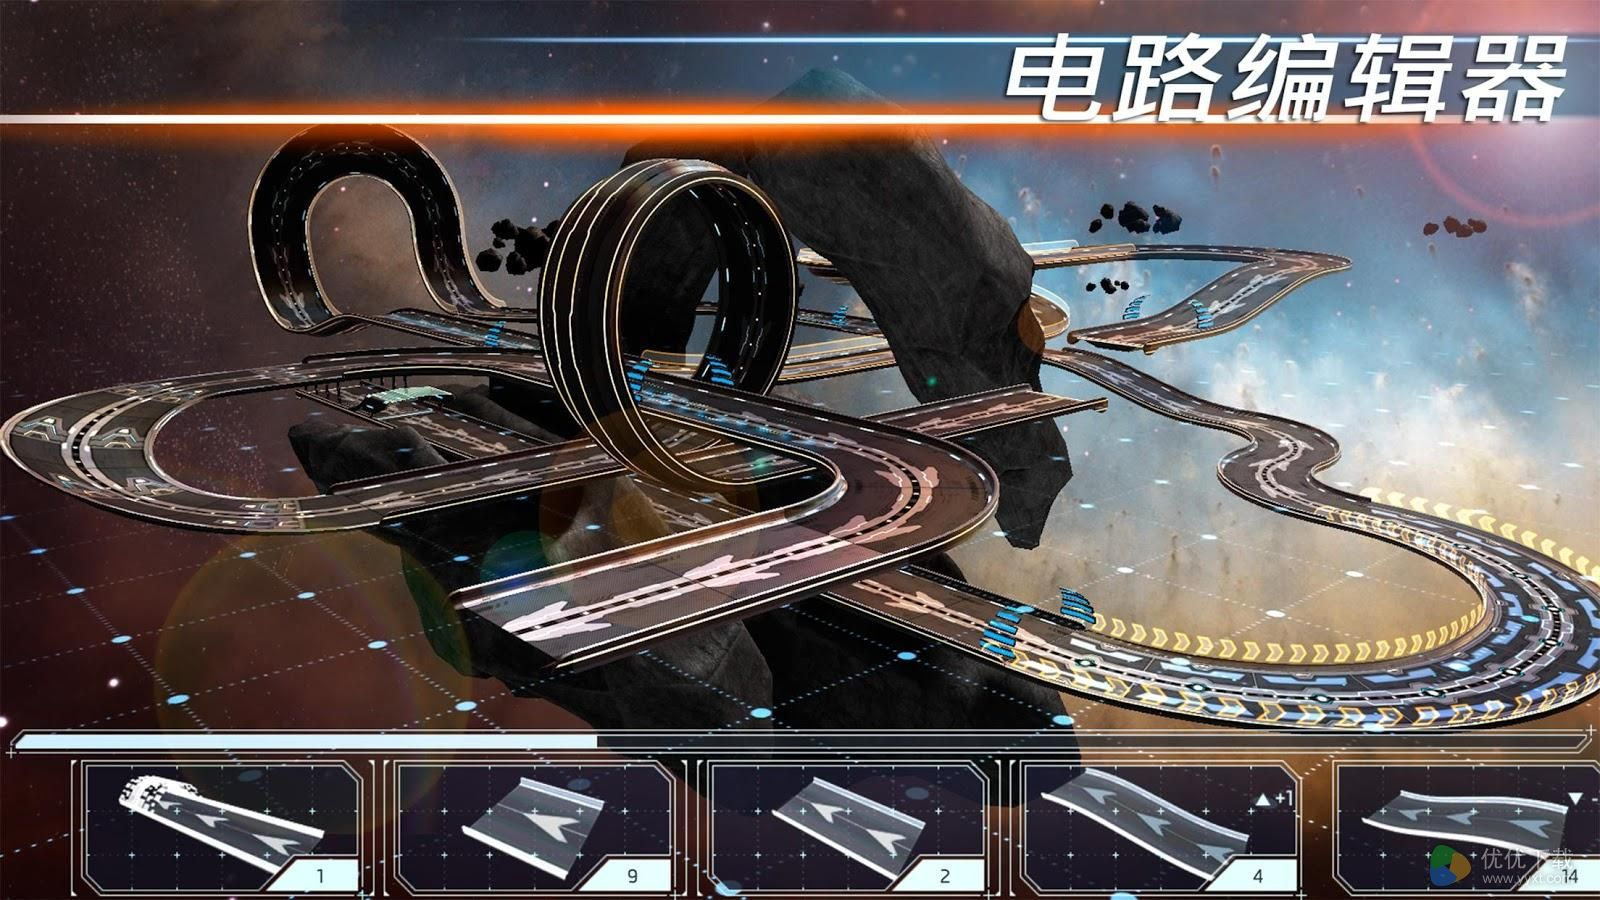 宇宙挑战ios版 V2.990